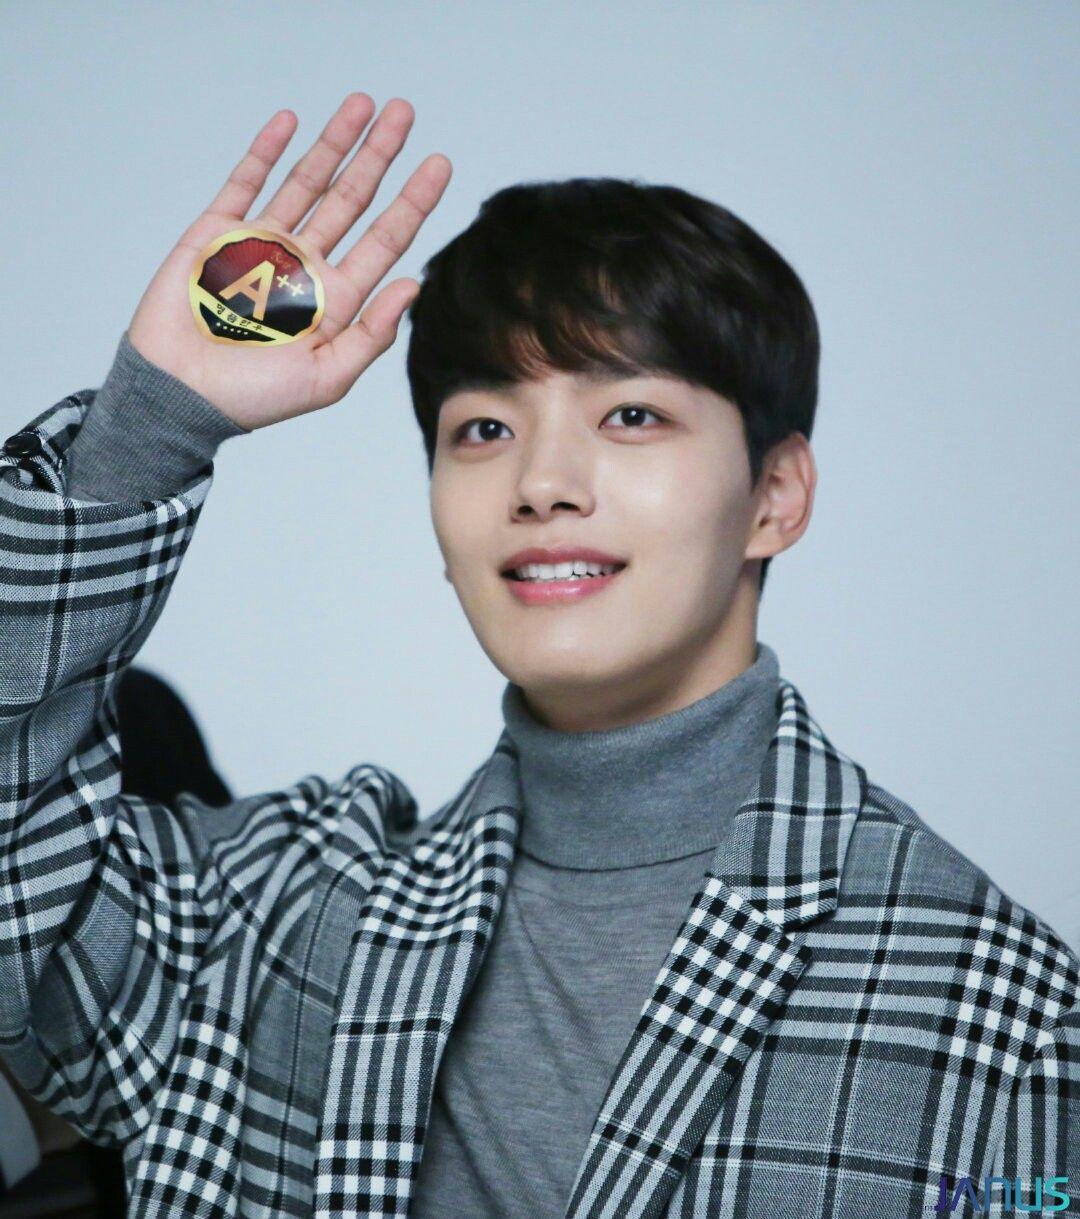 Pin de Are Heal en Jung So Min | Jung so min, Actrices